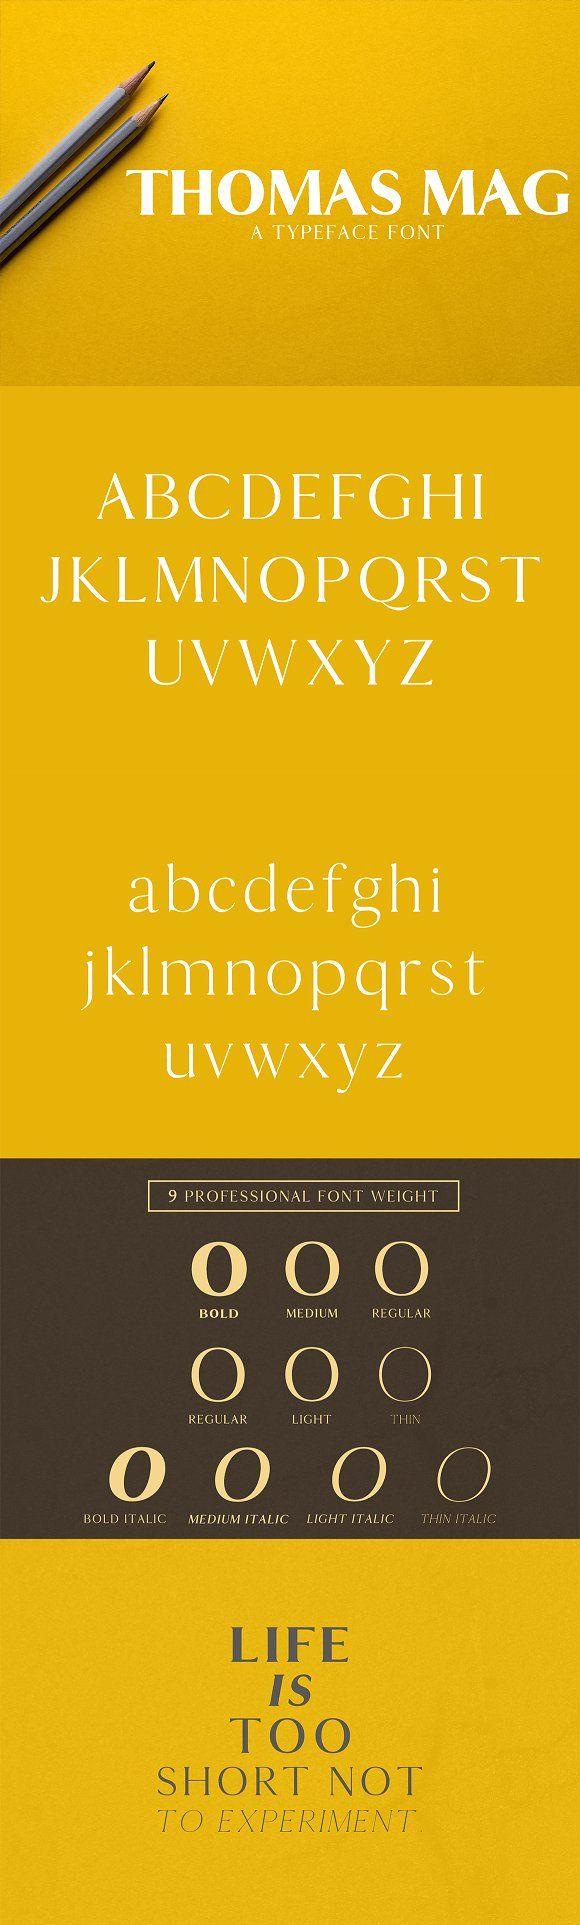 Thomas Mag Serif Typeface by Symufa on @creativemarket